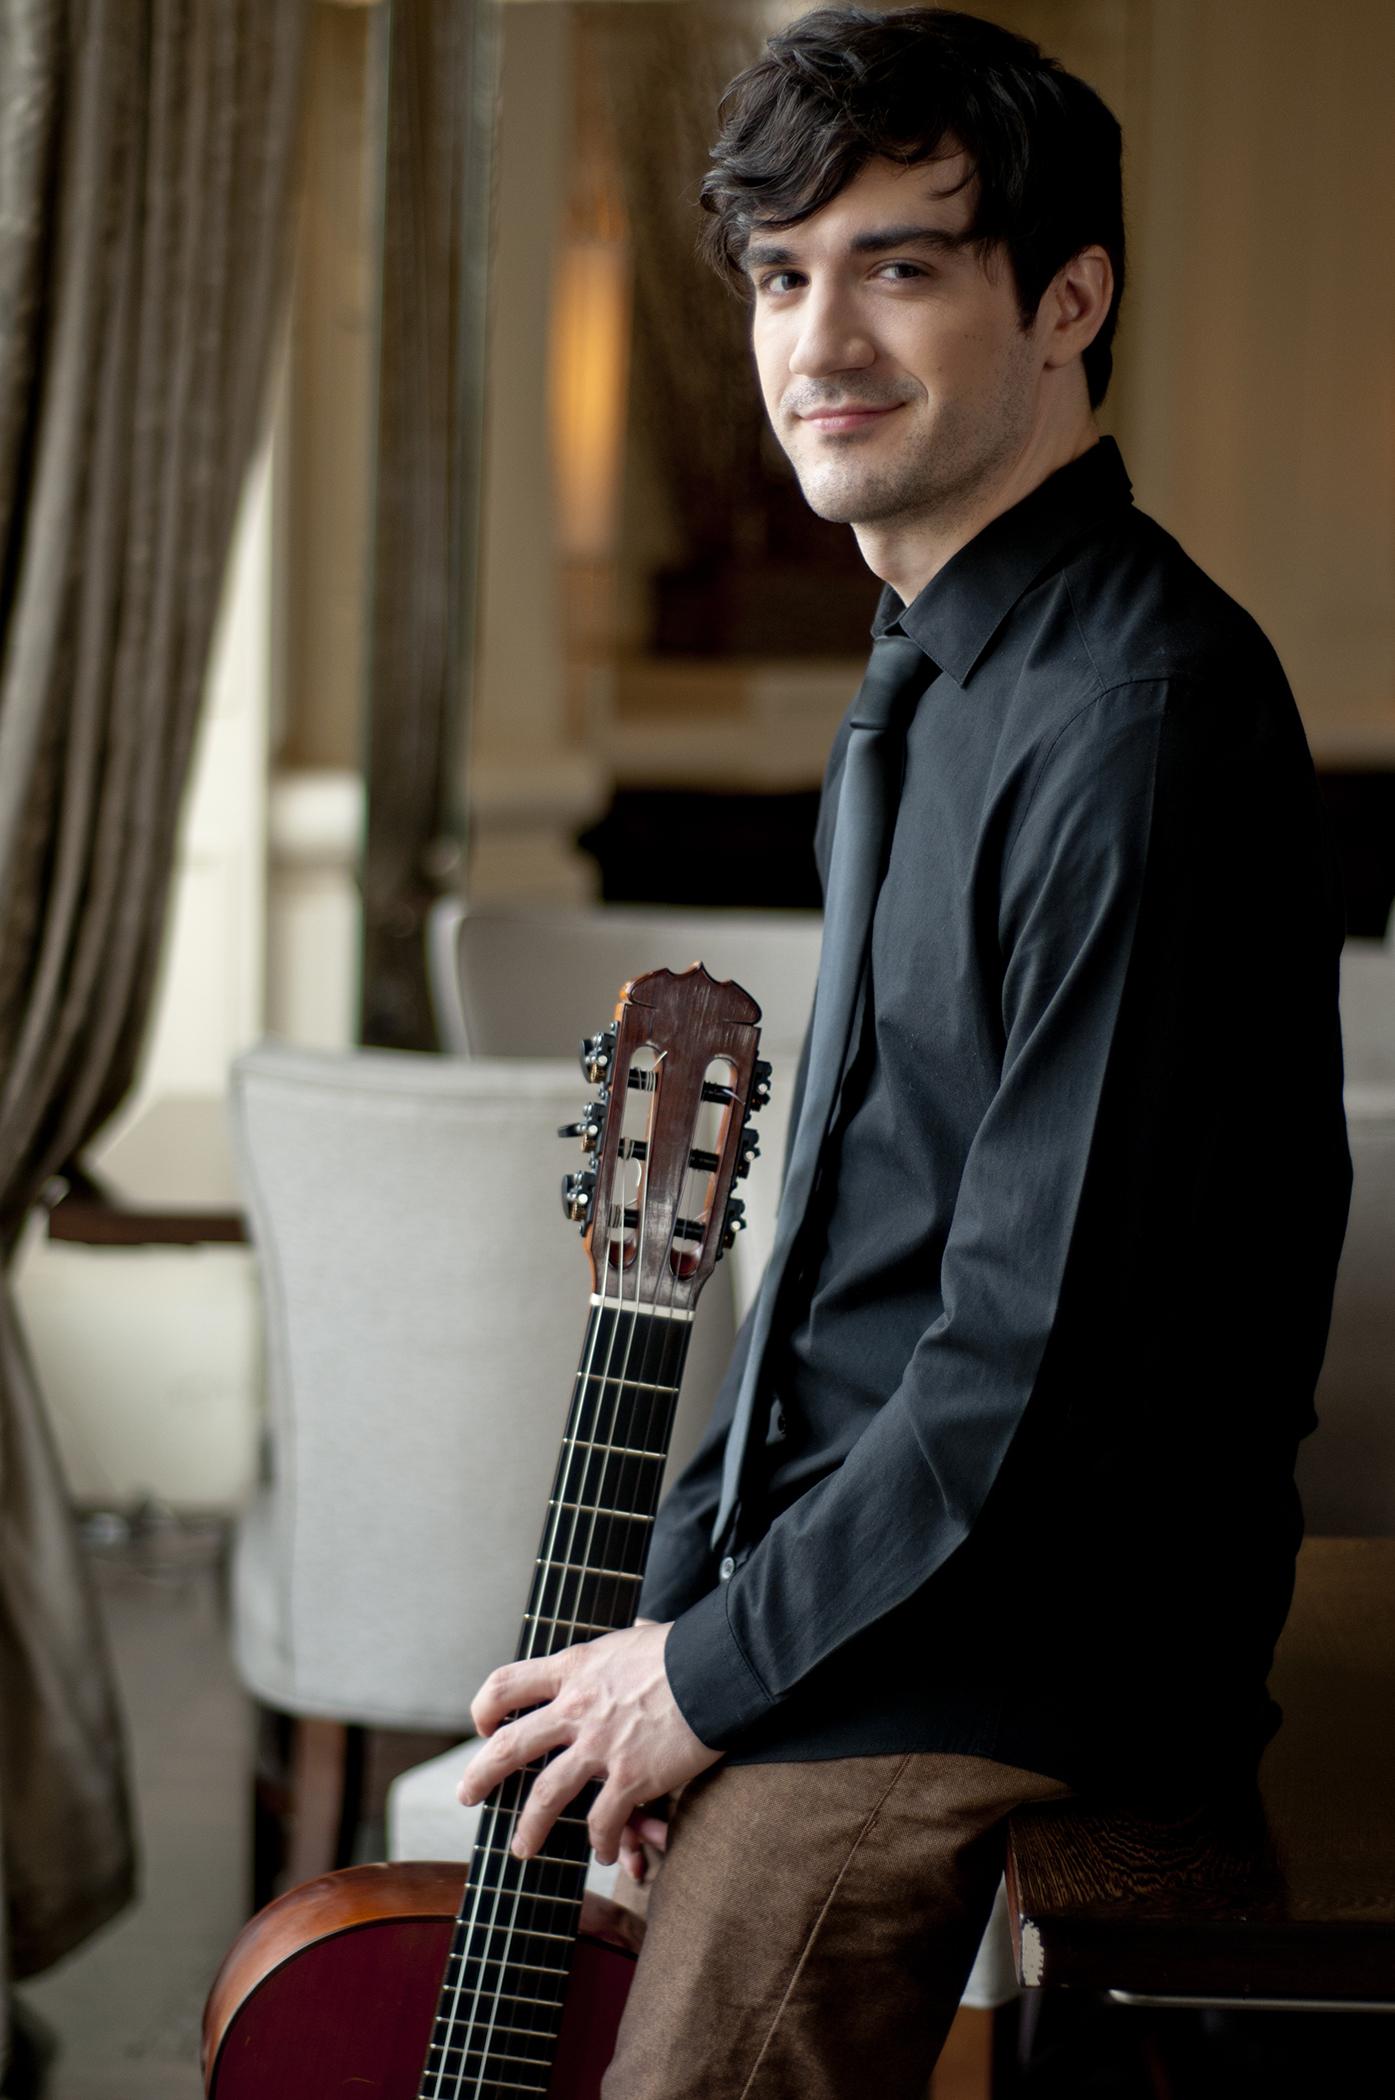 Jordan-Dodson-Guitar-Vertical_2